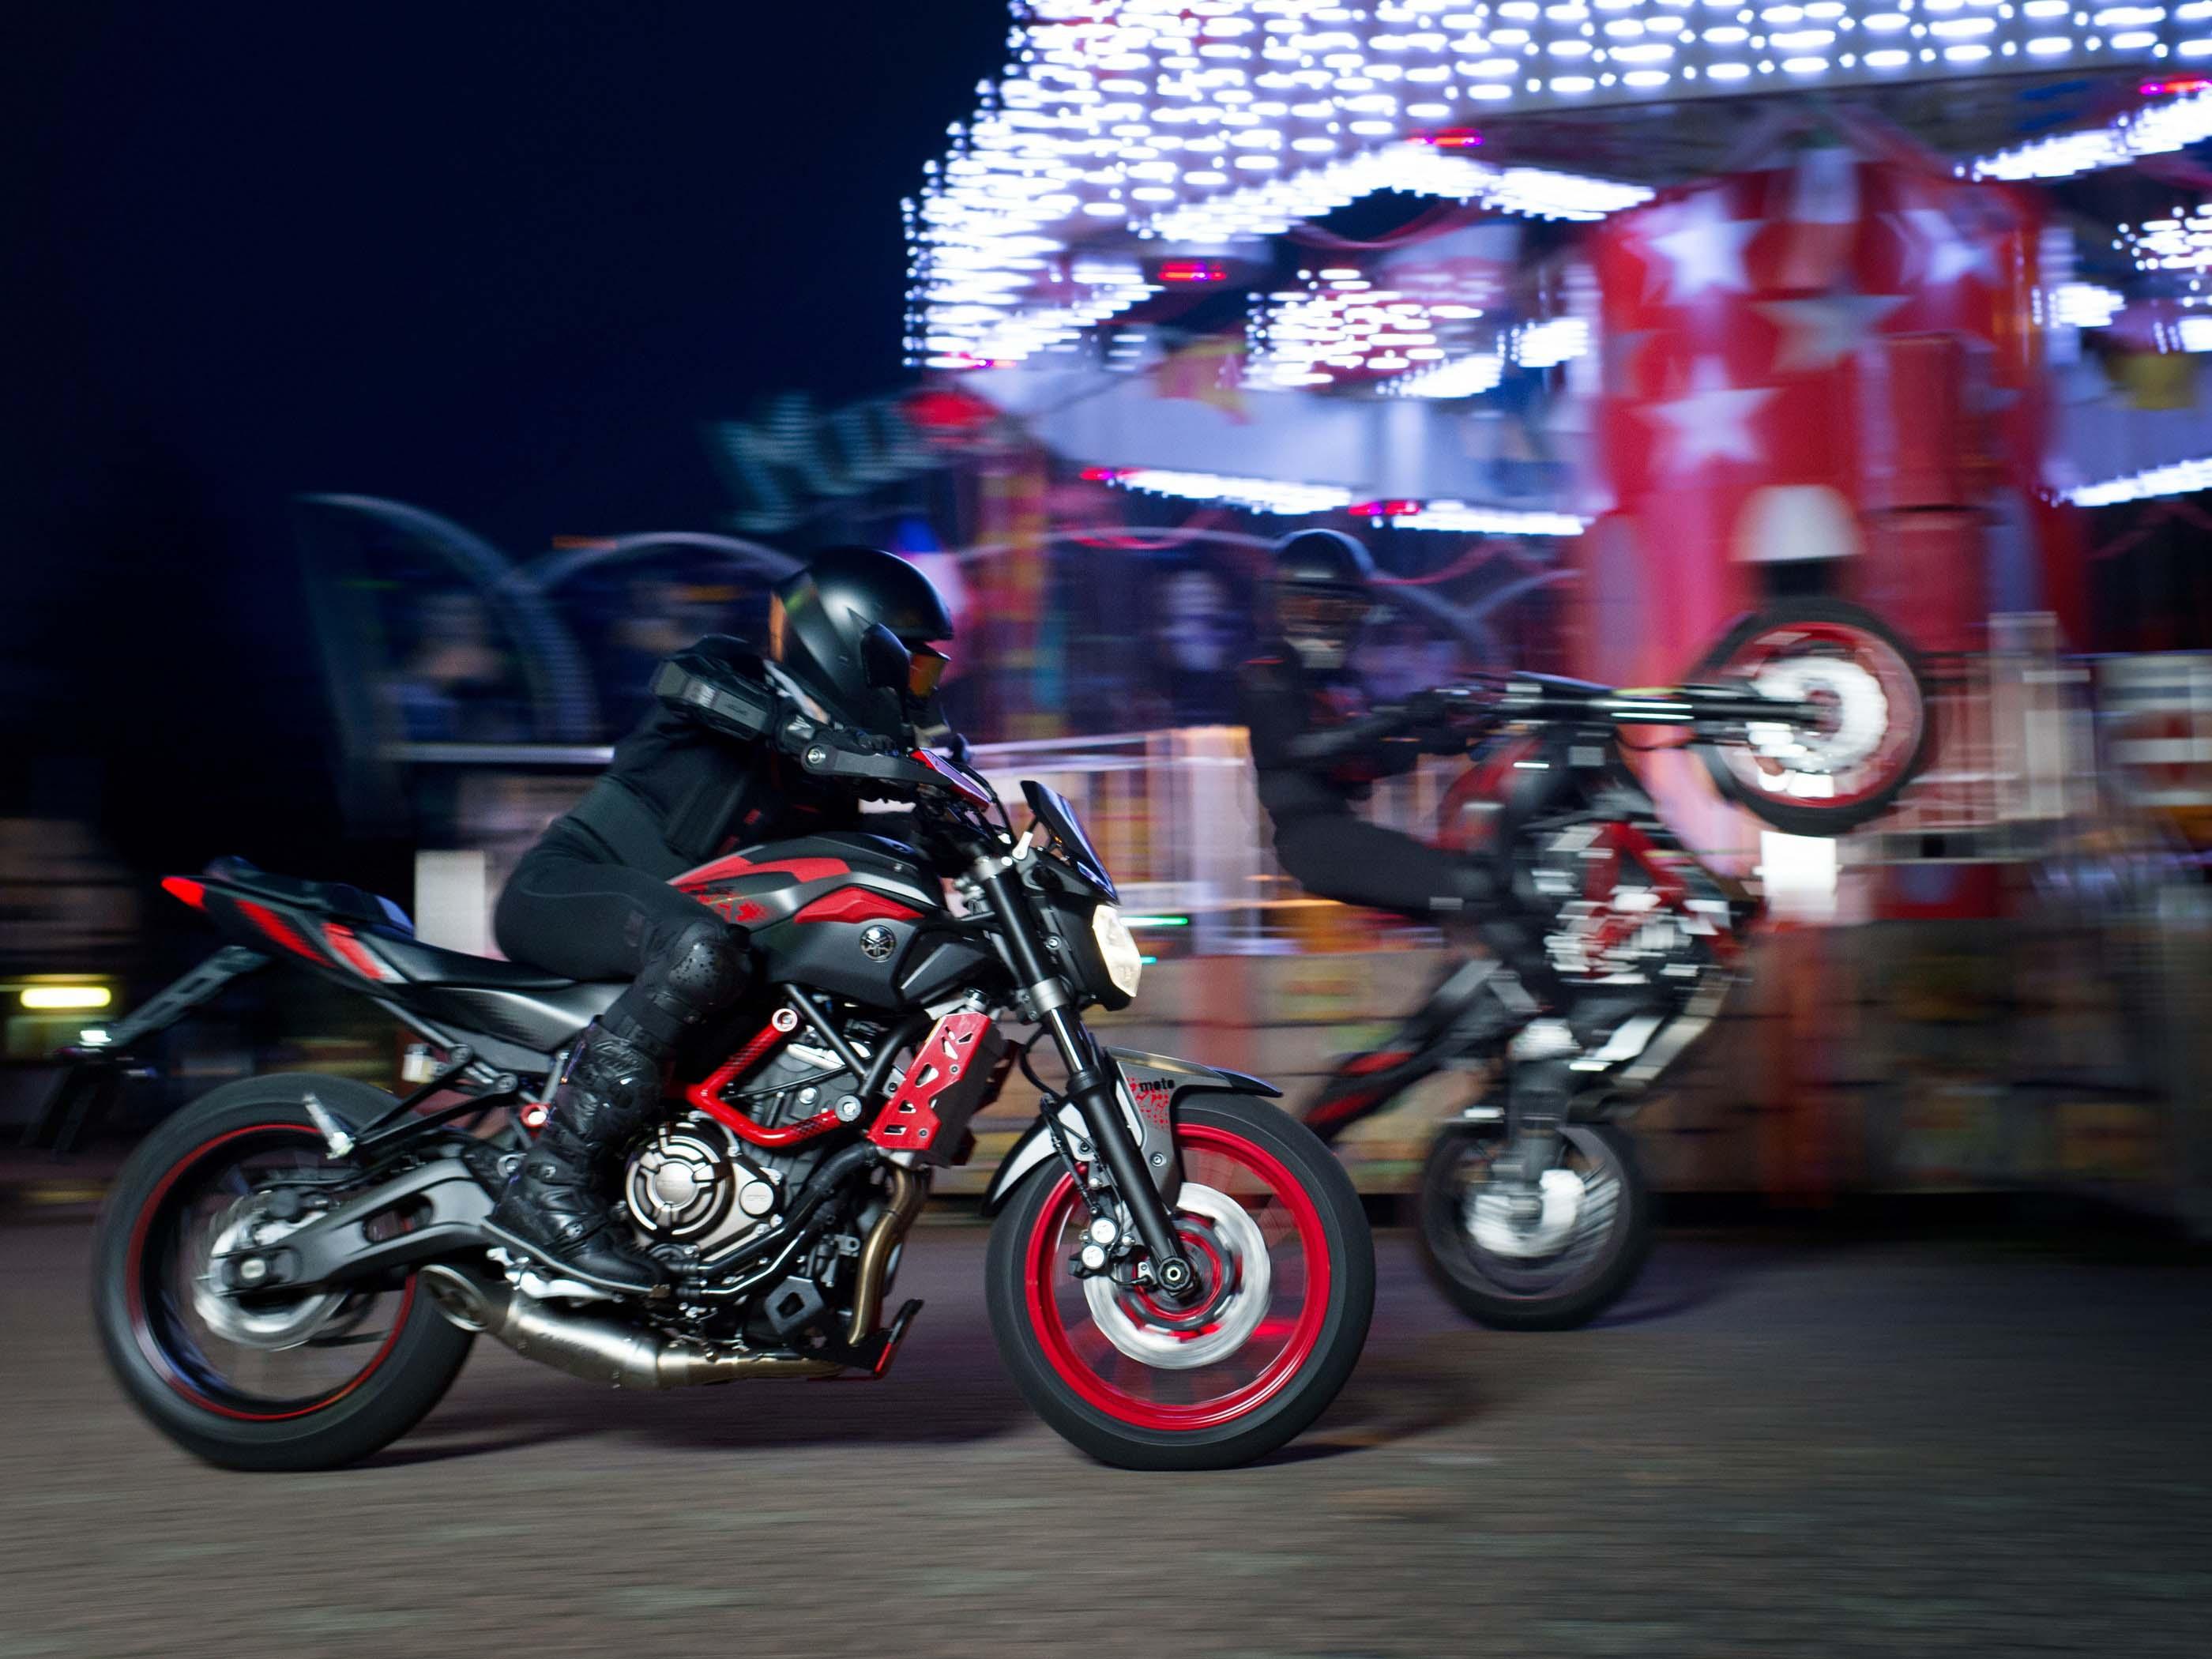 2015 Yamaha MT-07 Moto Cage - For Euro Stunters - Asphalt ...